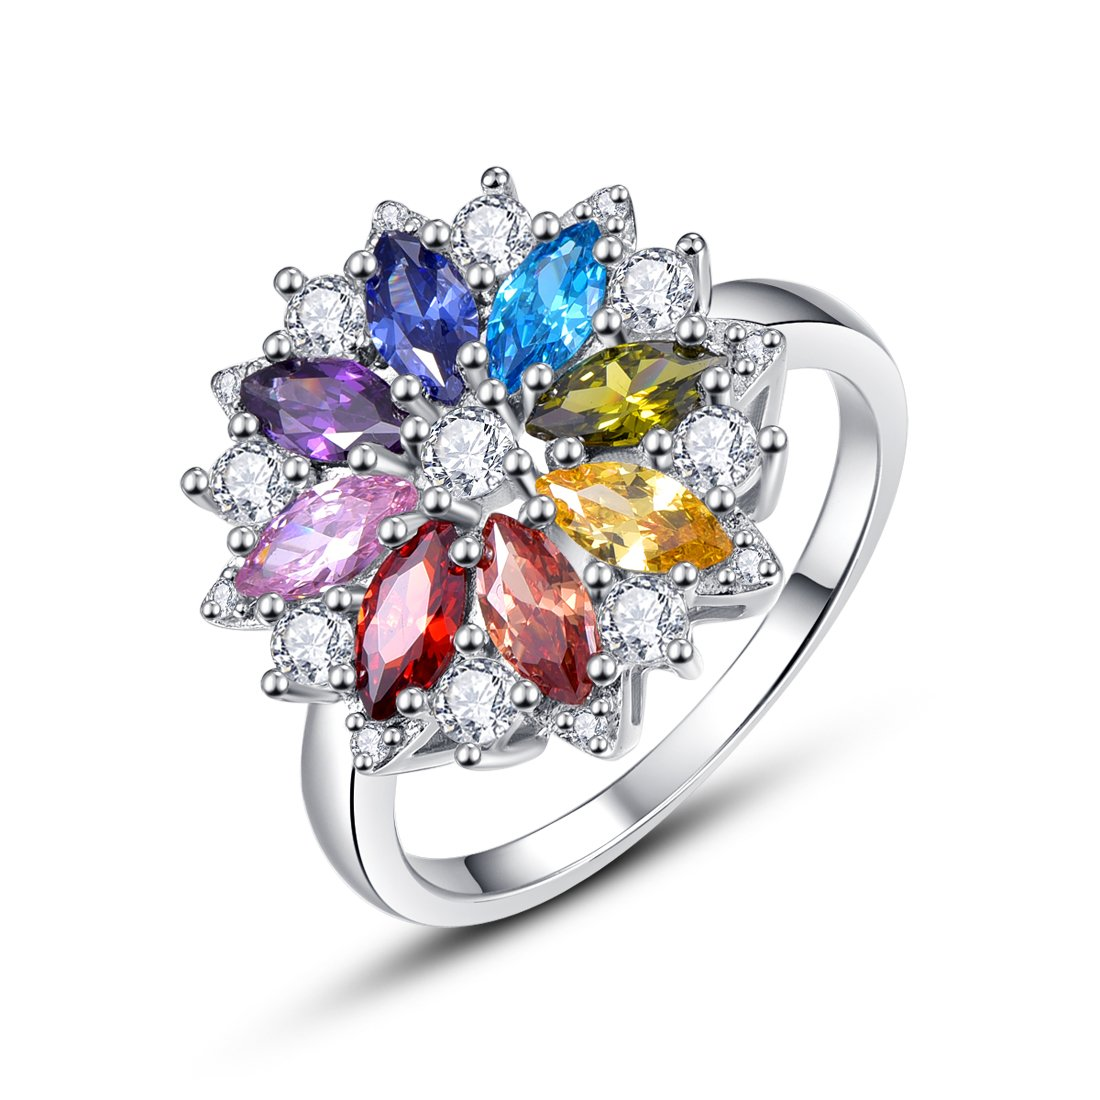 Merthus Womens 925 Sterling Silver Created Gemstones Cluster Flower Statement Ring